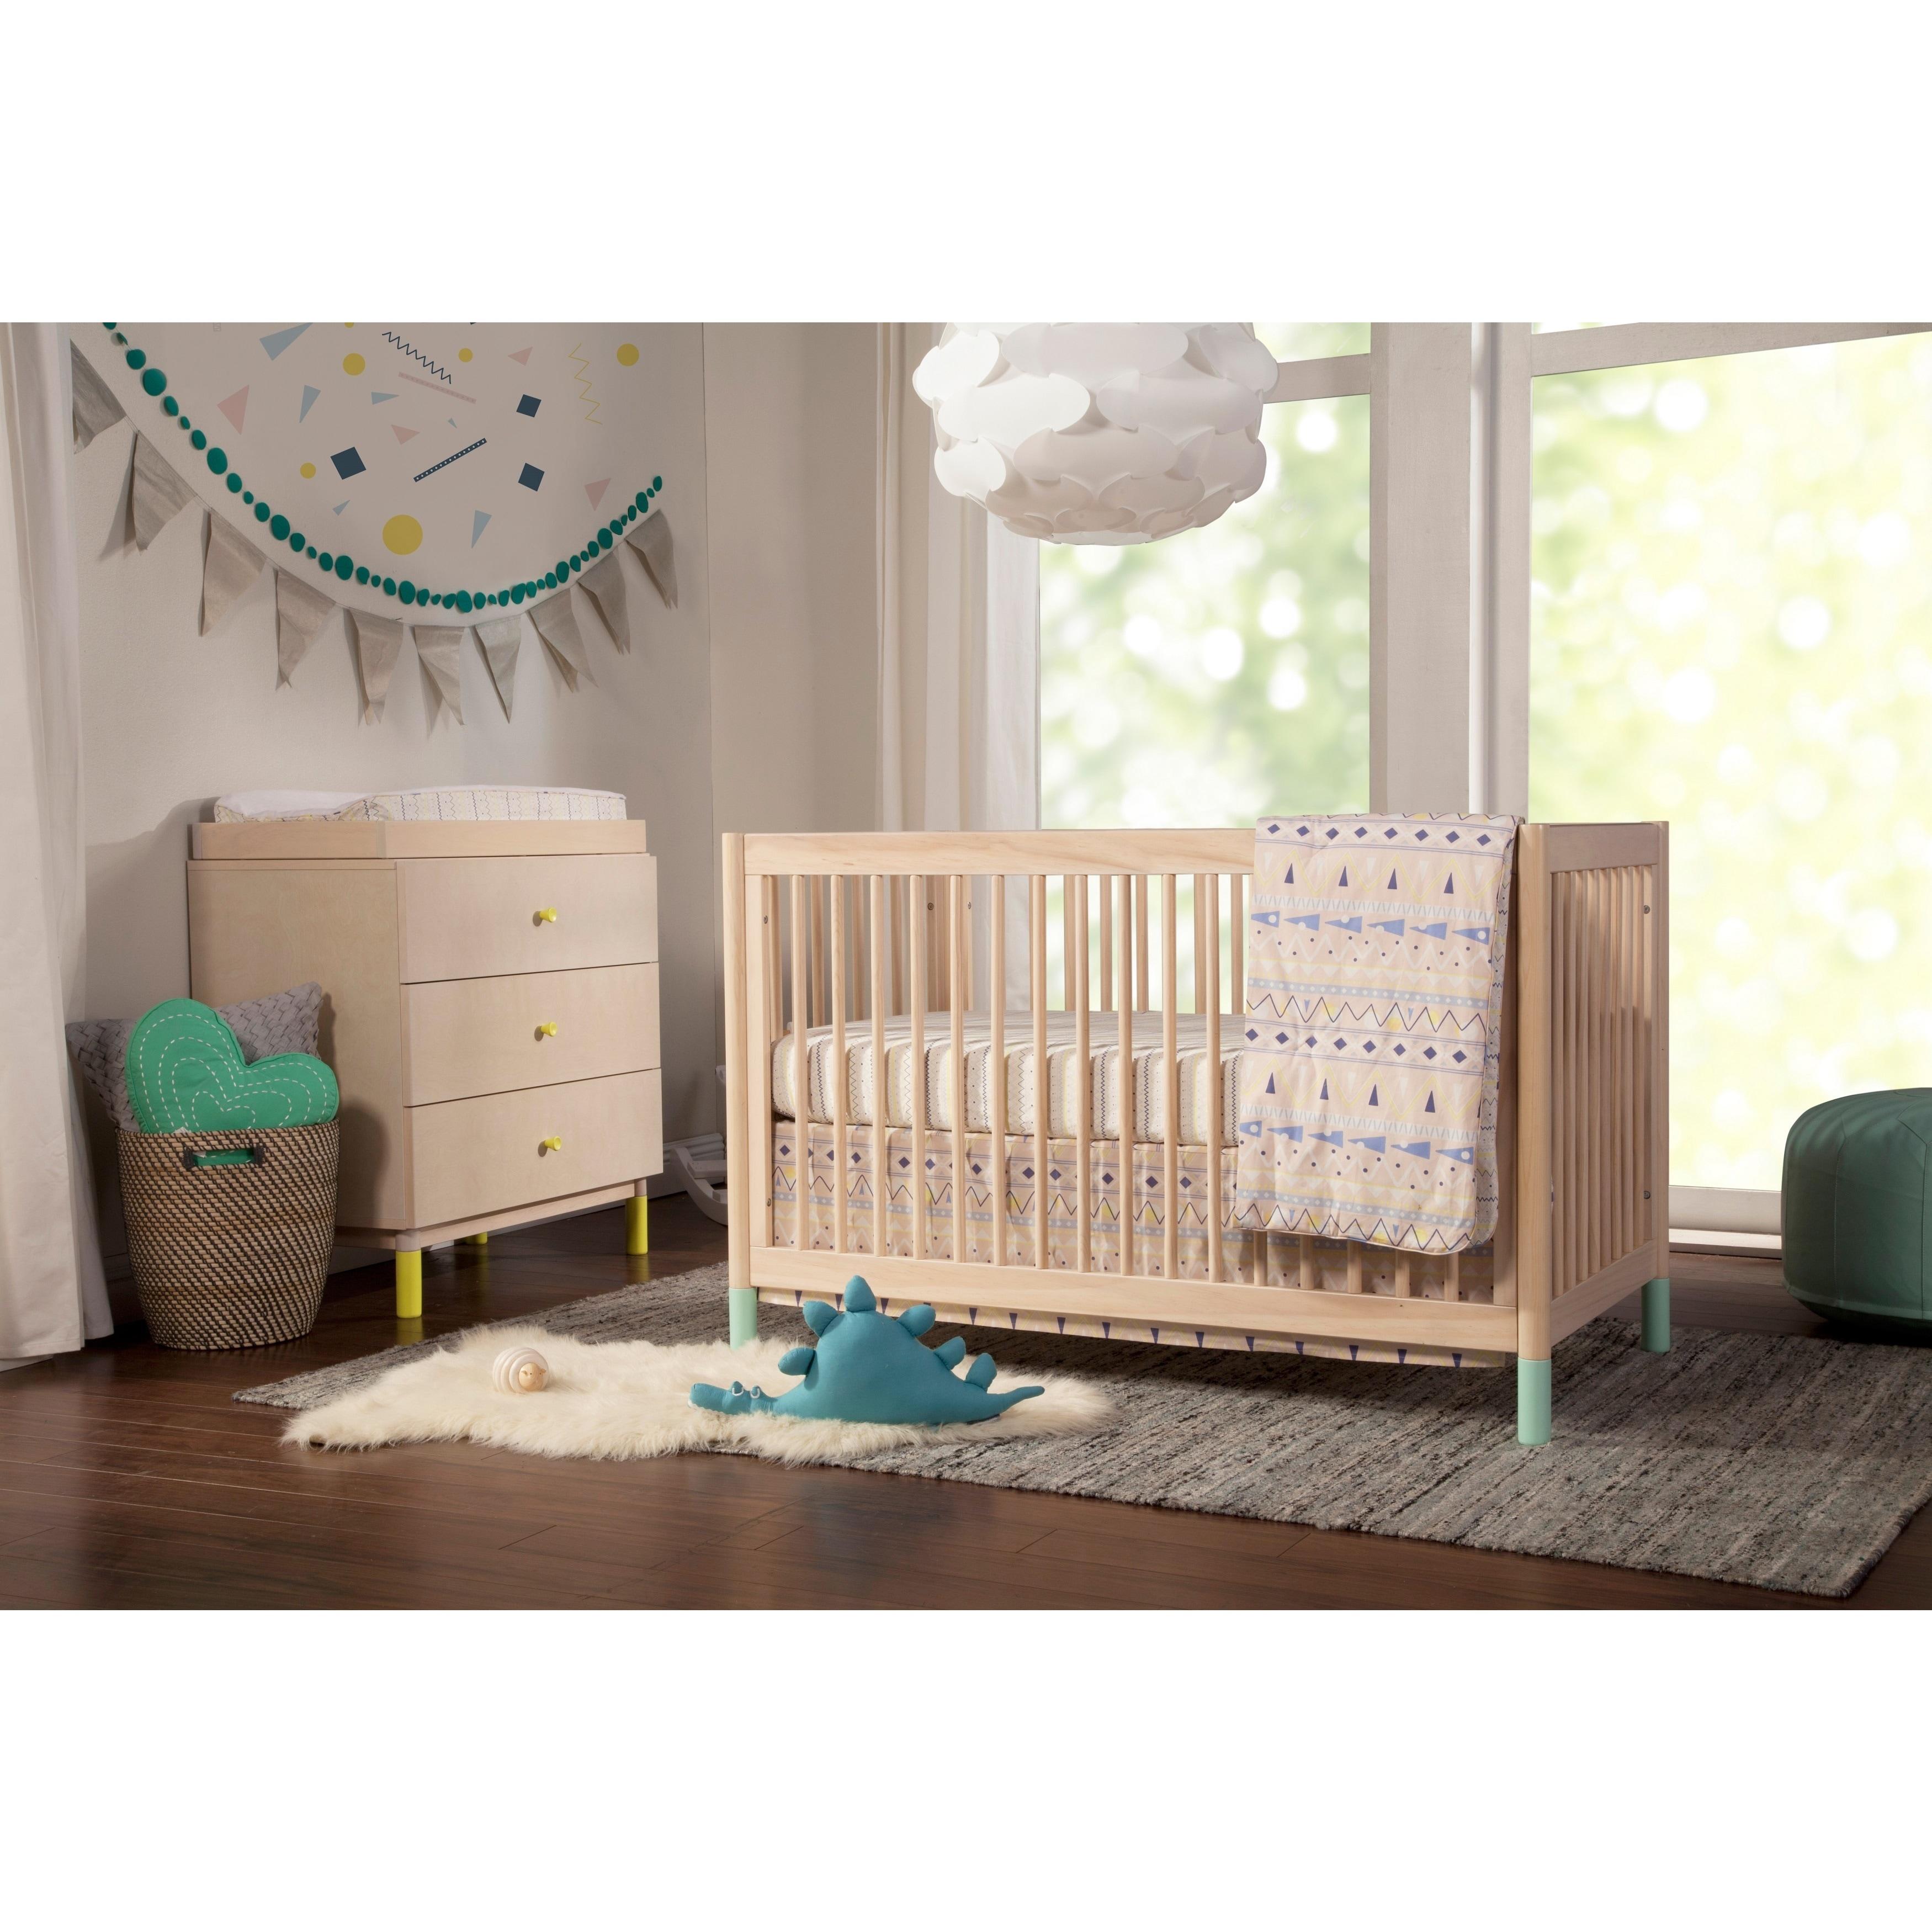 Nursery Bedding And Decor Set